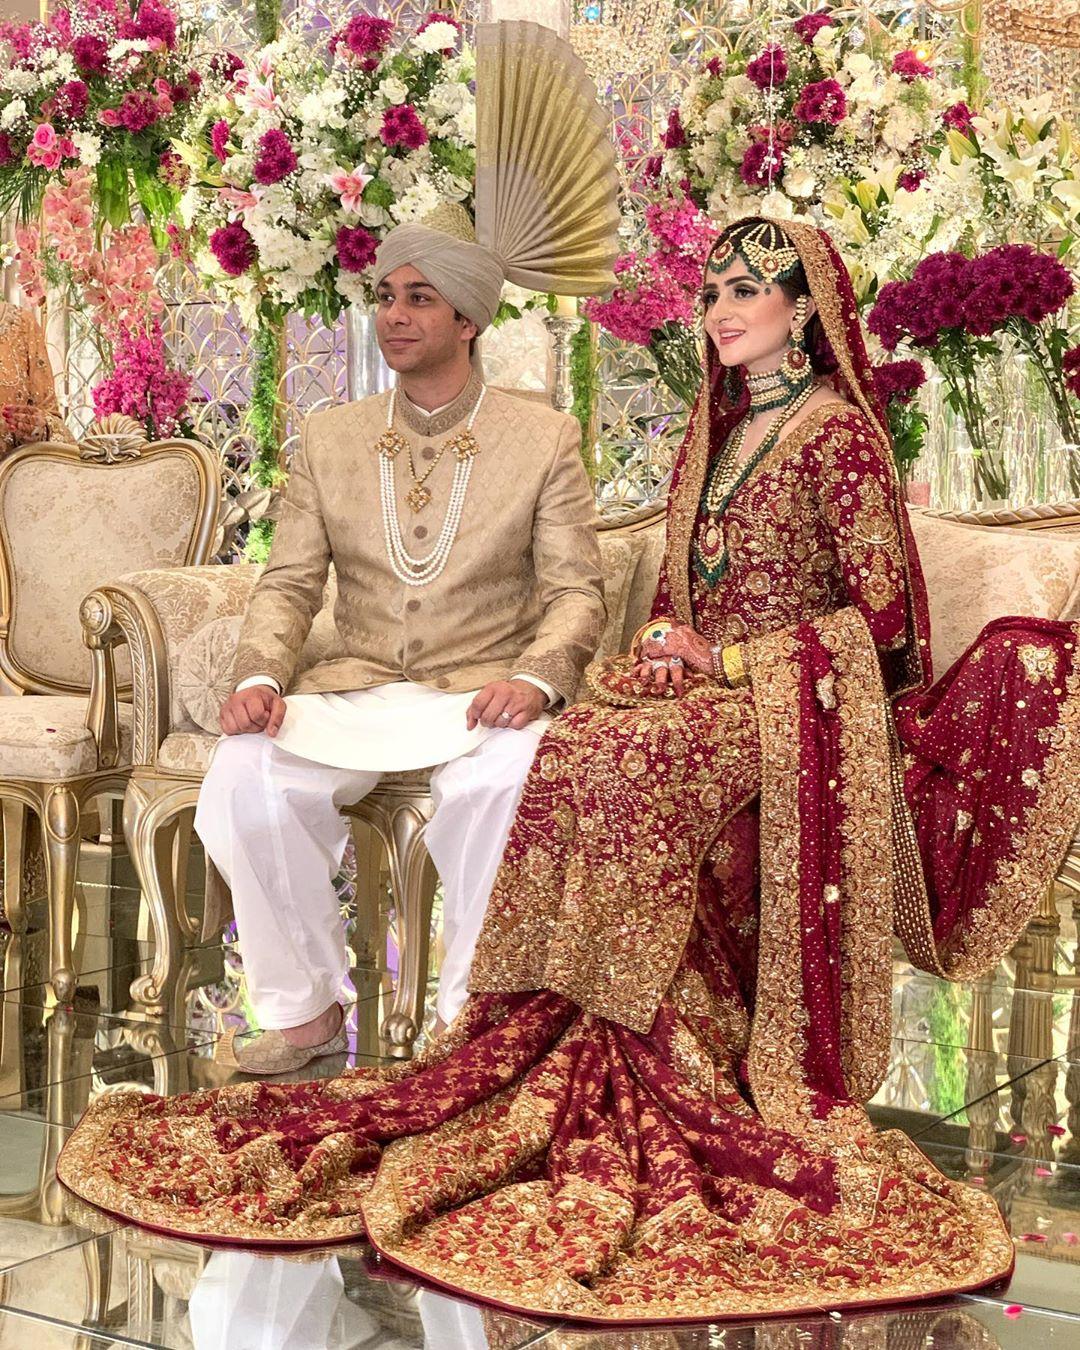 Former Chief Justice of Pakistan Saqib Nisar Son Najam Wedding Pictures